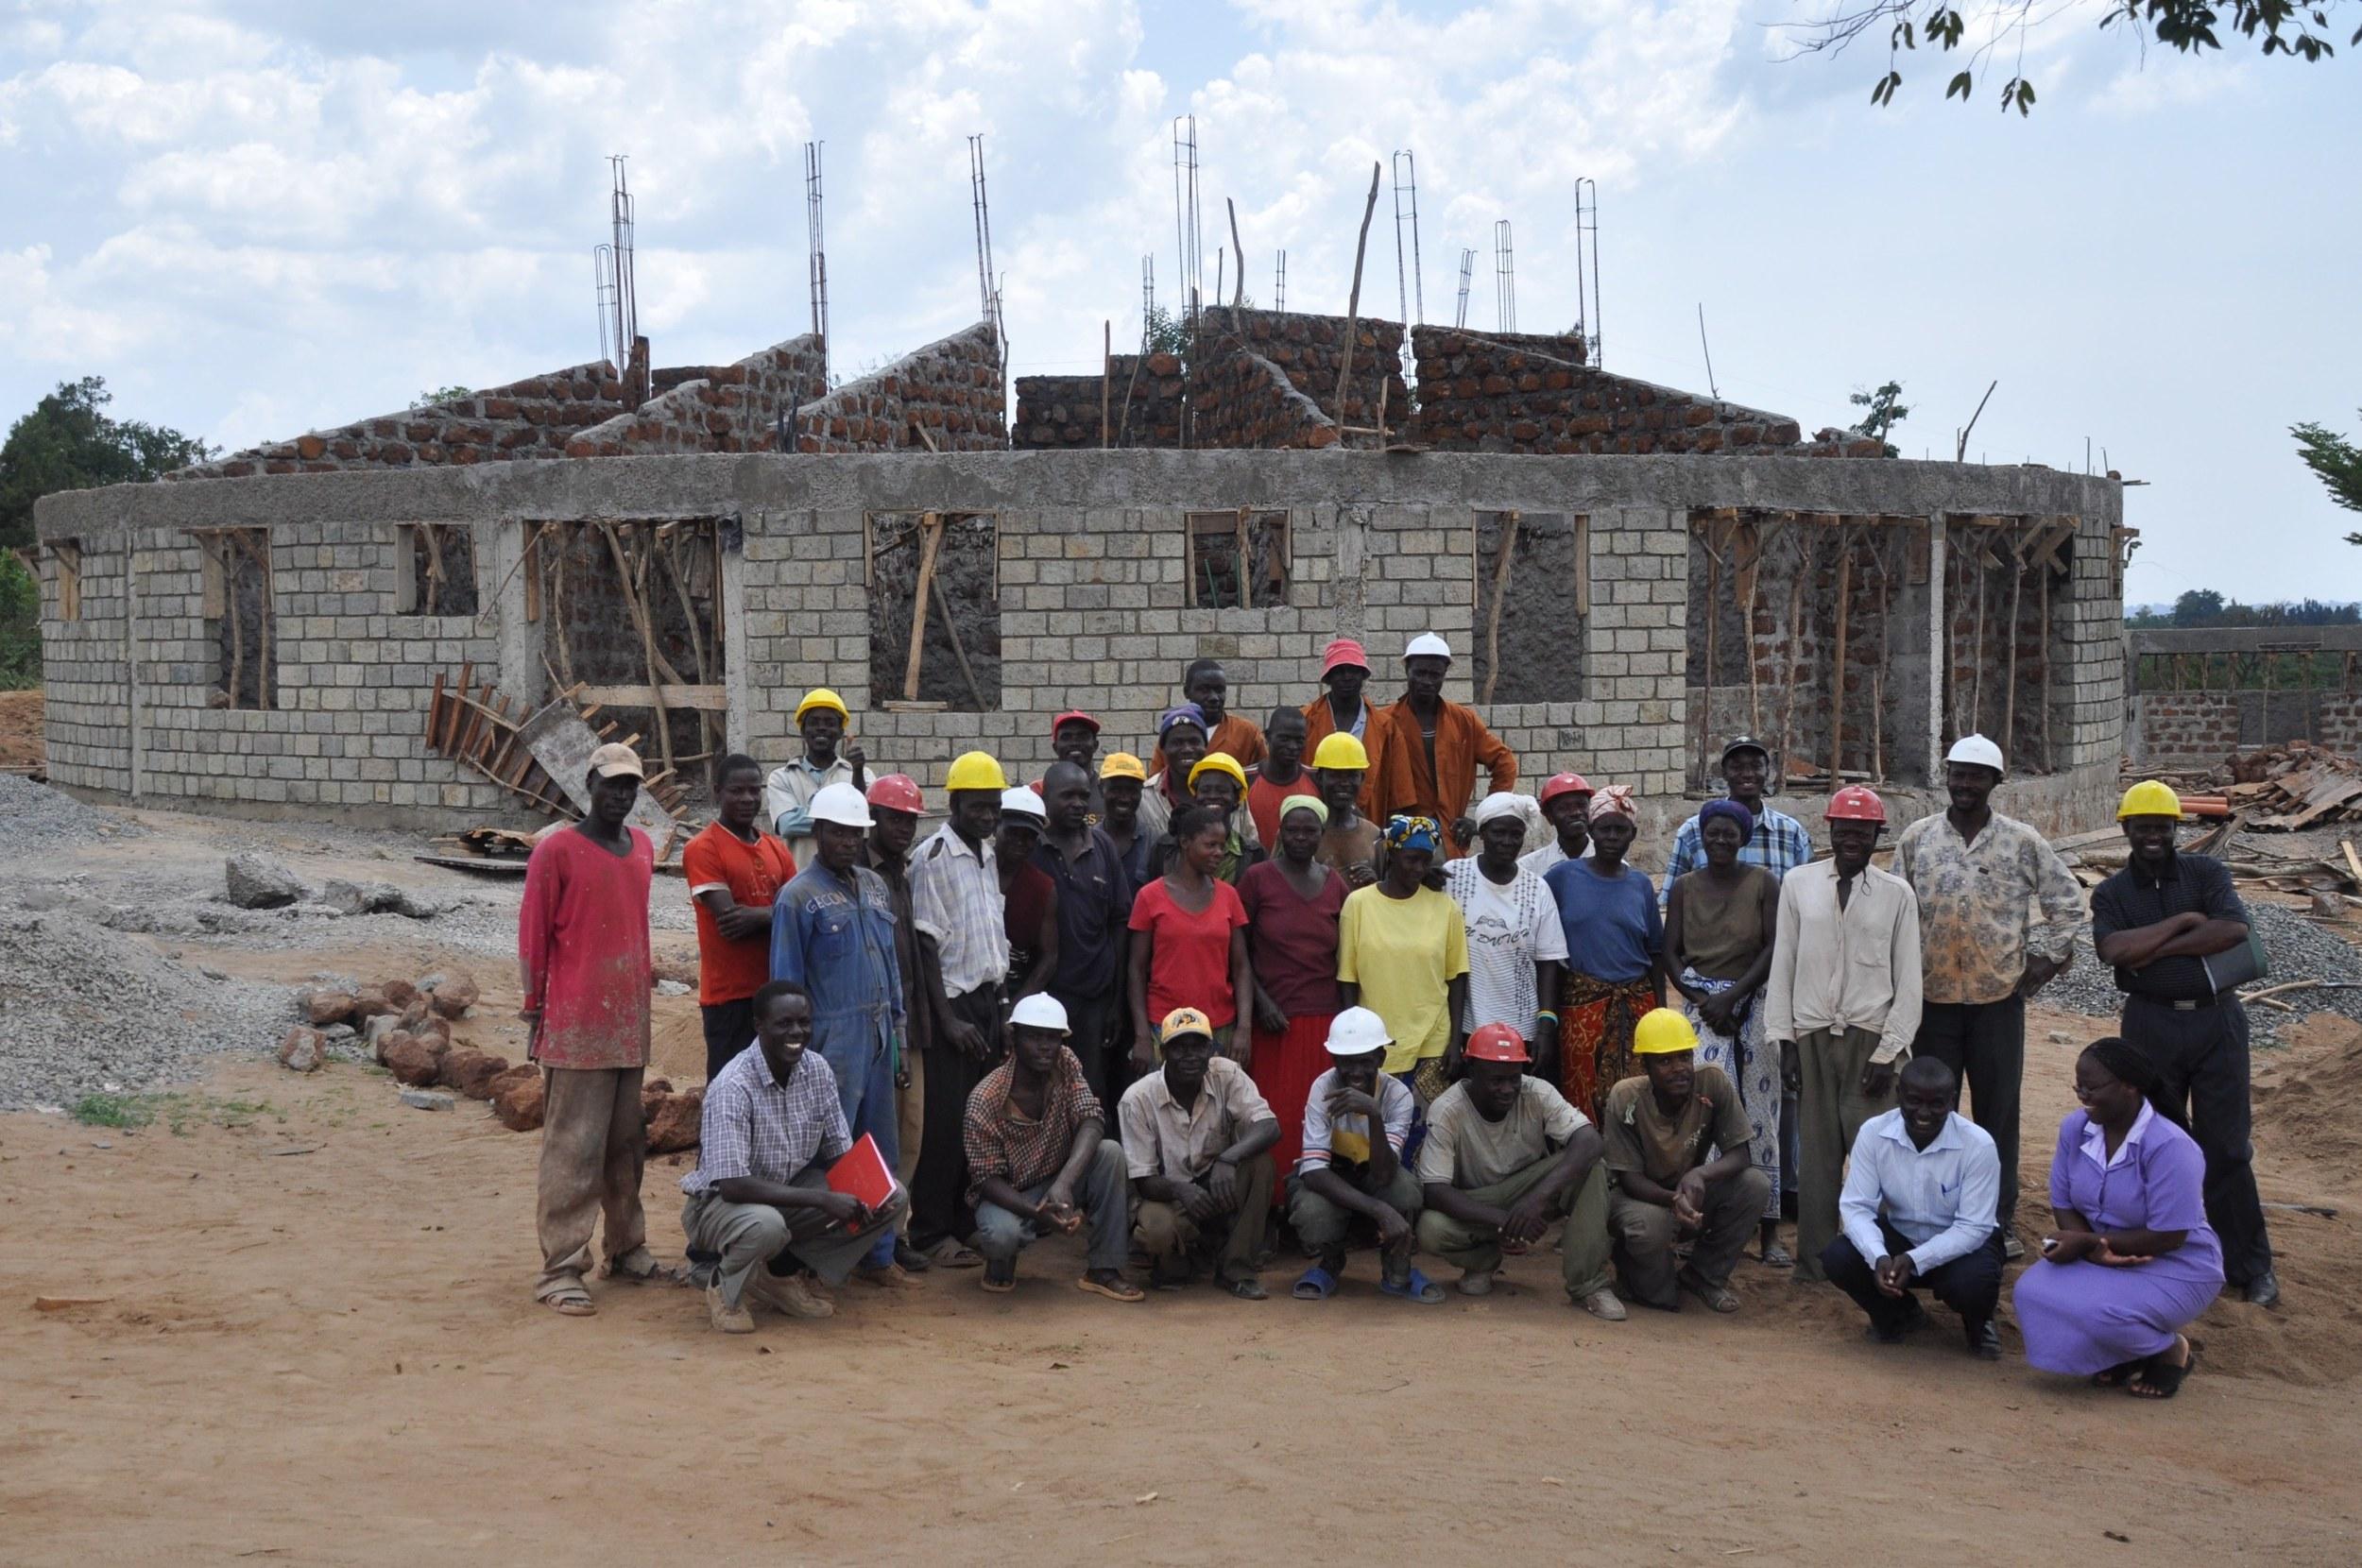 construction-crew_5430552598_o.jpg